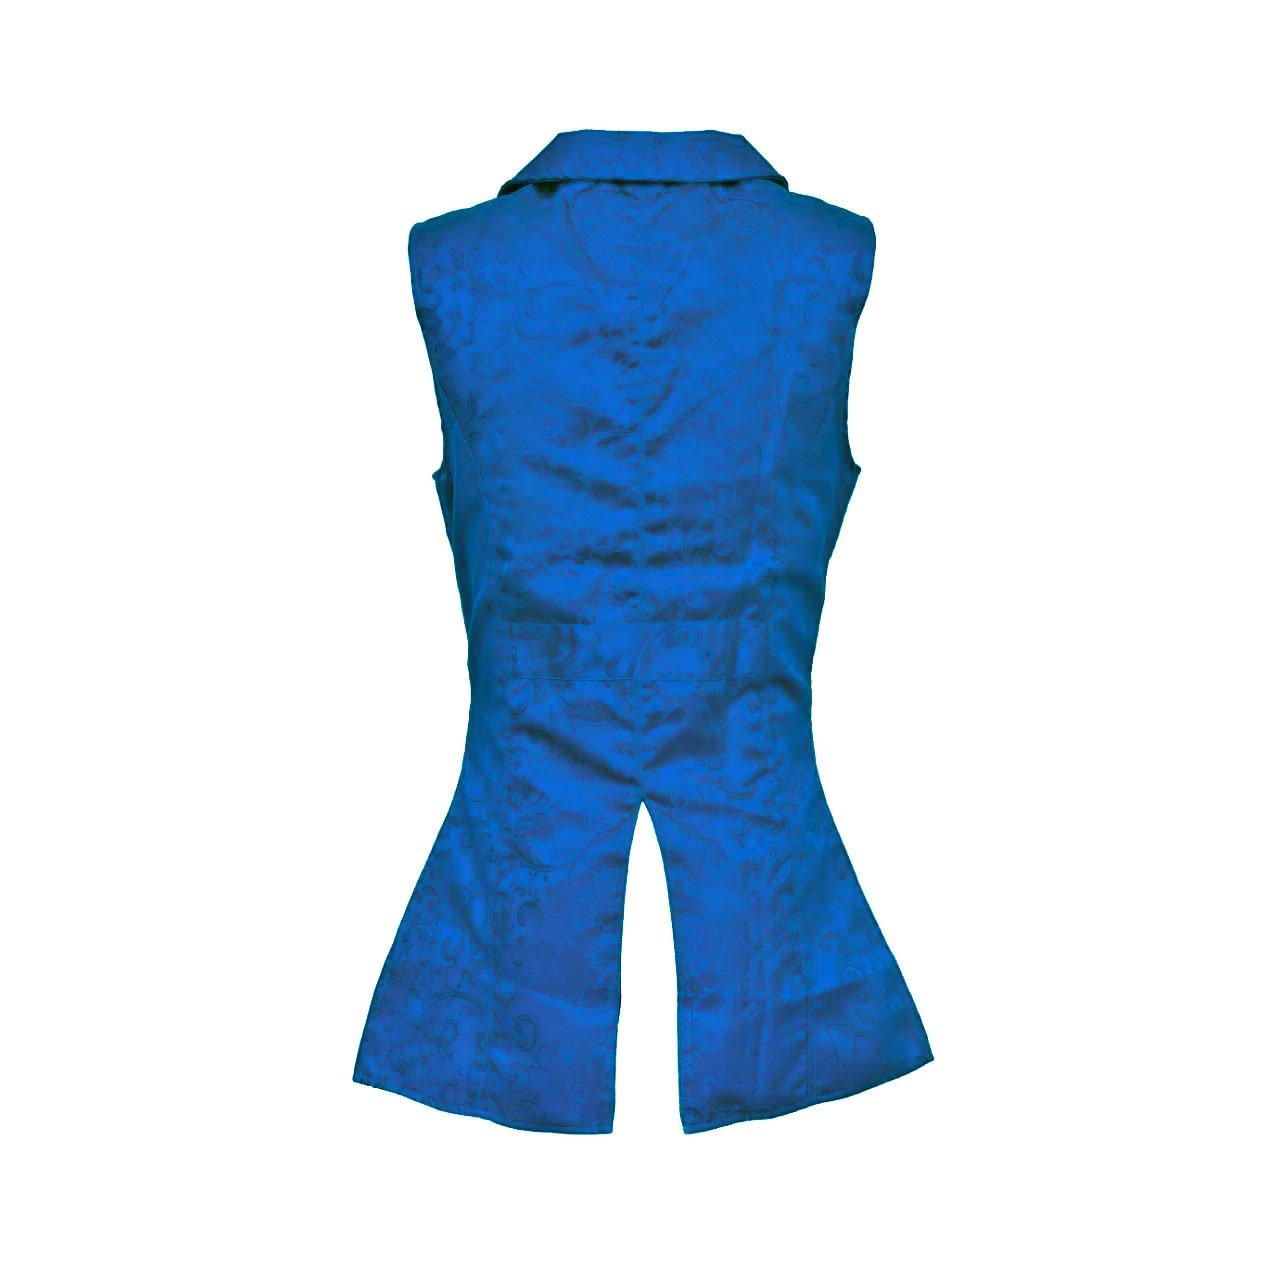 DARKROCK Royal Blue Double Breasted GOVERNOR Vest Waistcoat (back)